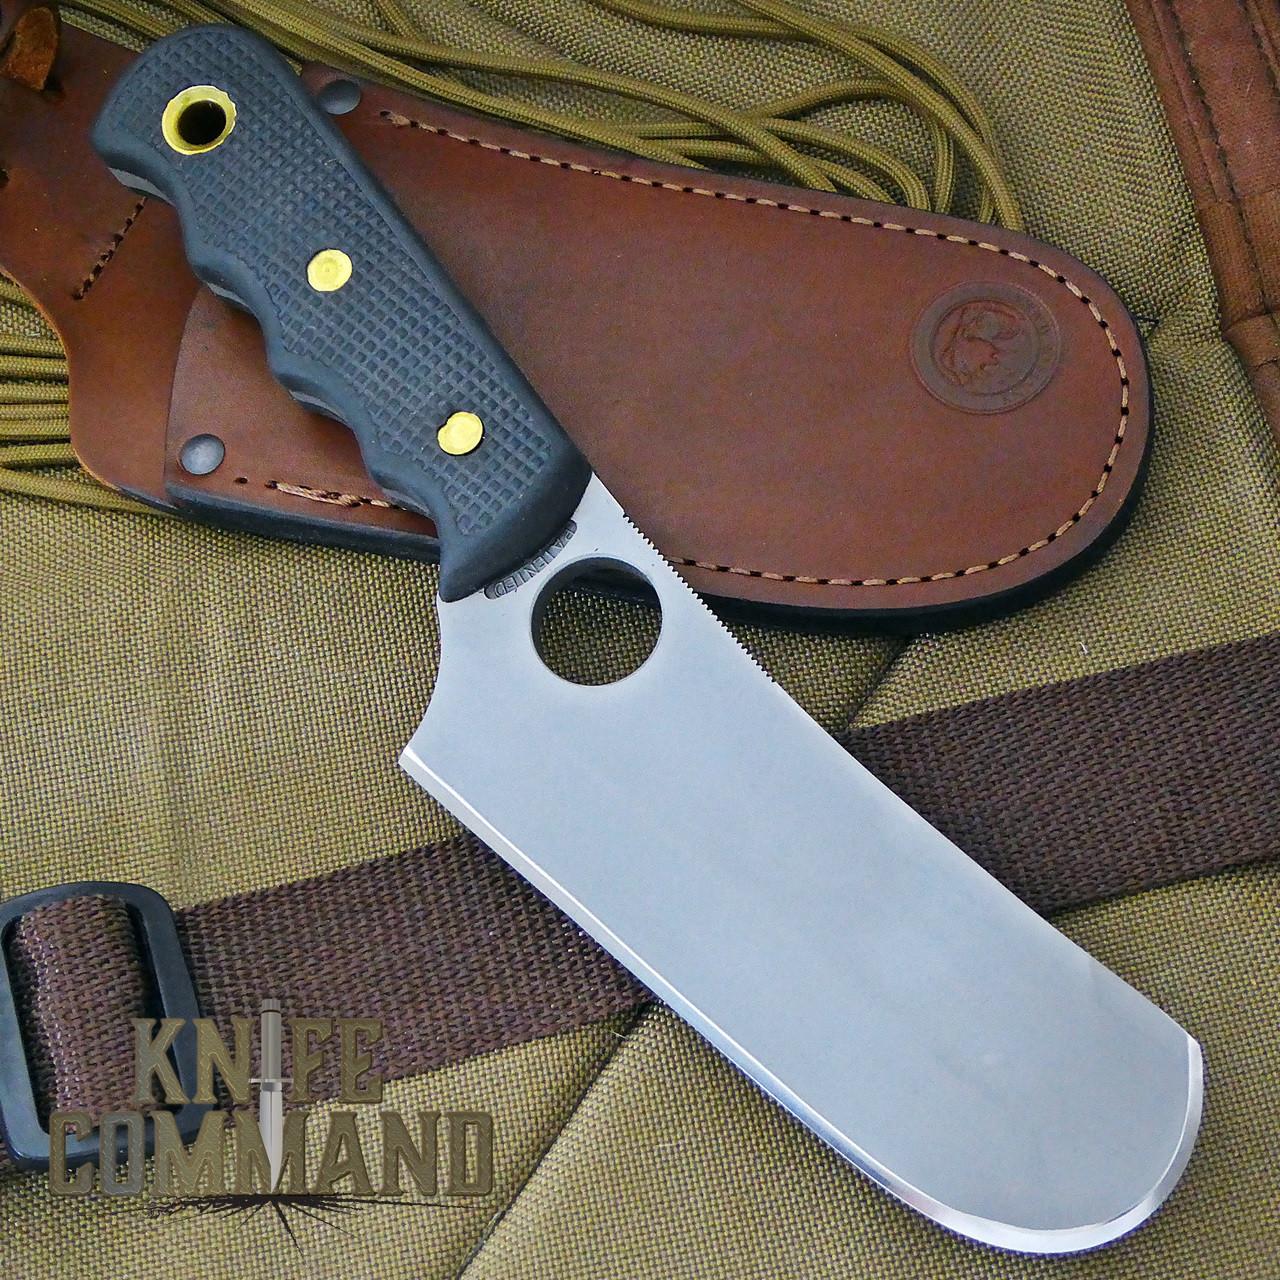 Knives of Alaska Brown Bear Cleaver Suregrip Hunting Knife.  Great for big game.